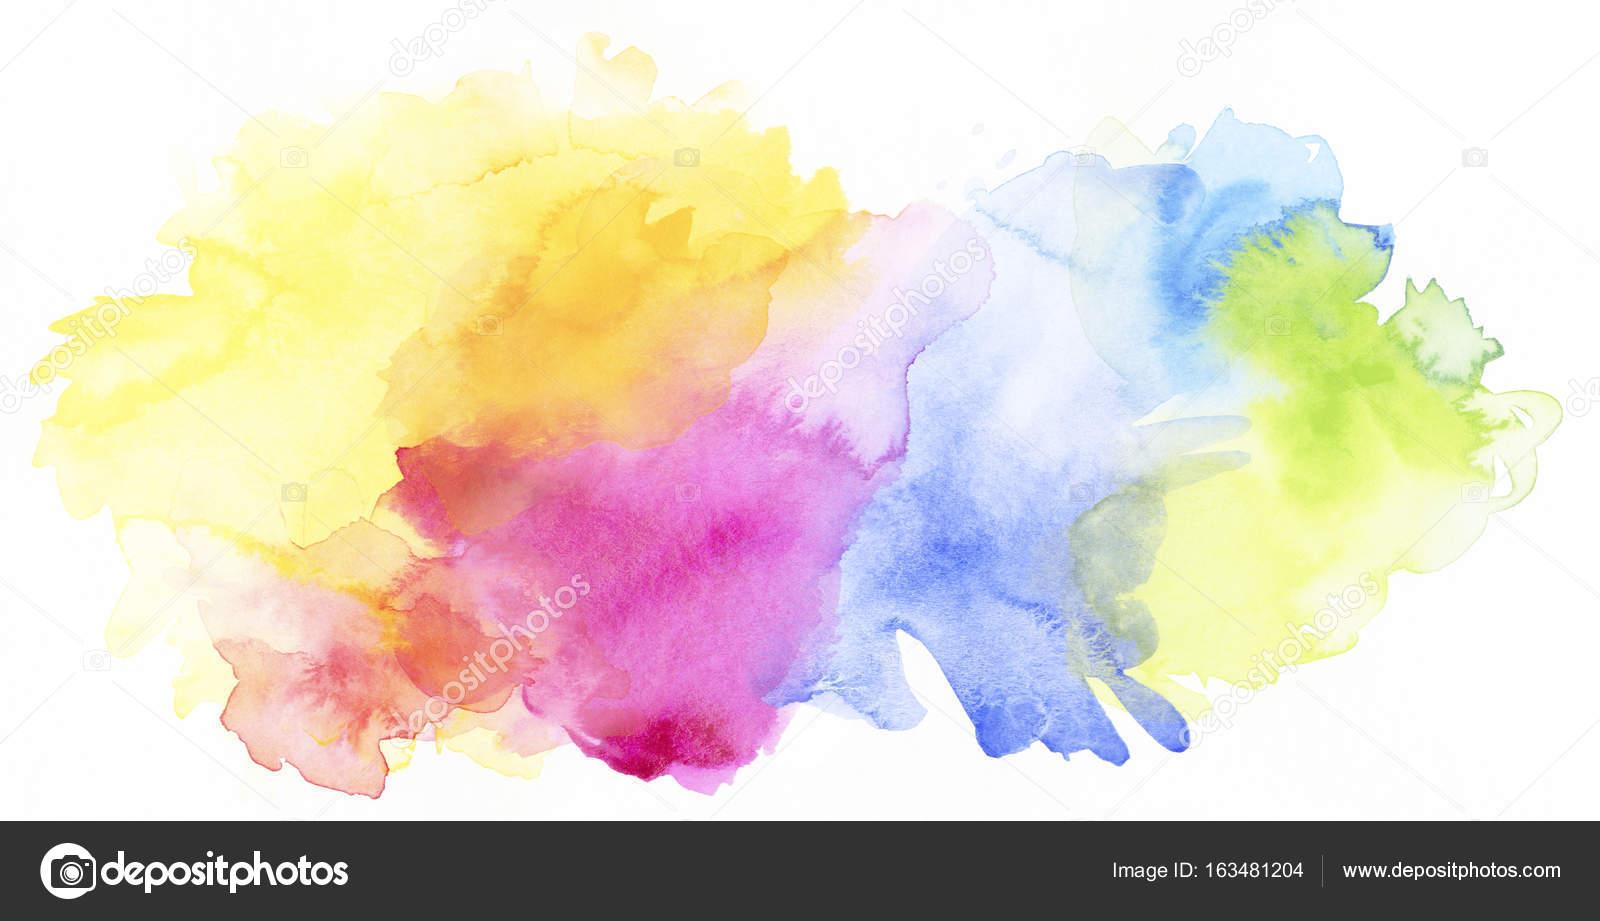 Texturas De Colores Pastel: Arco-íris Pastel Colorido Tintas Aquarela E Texturas Em